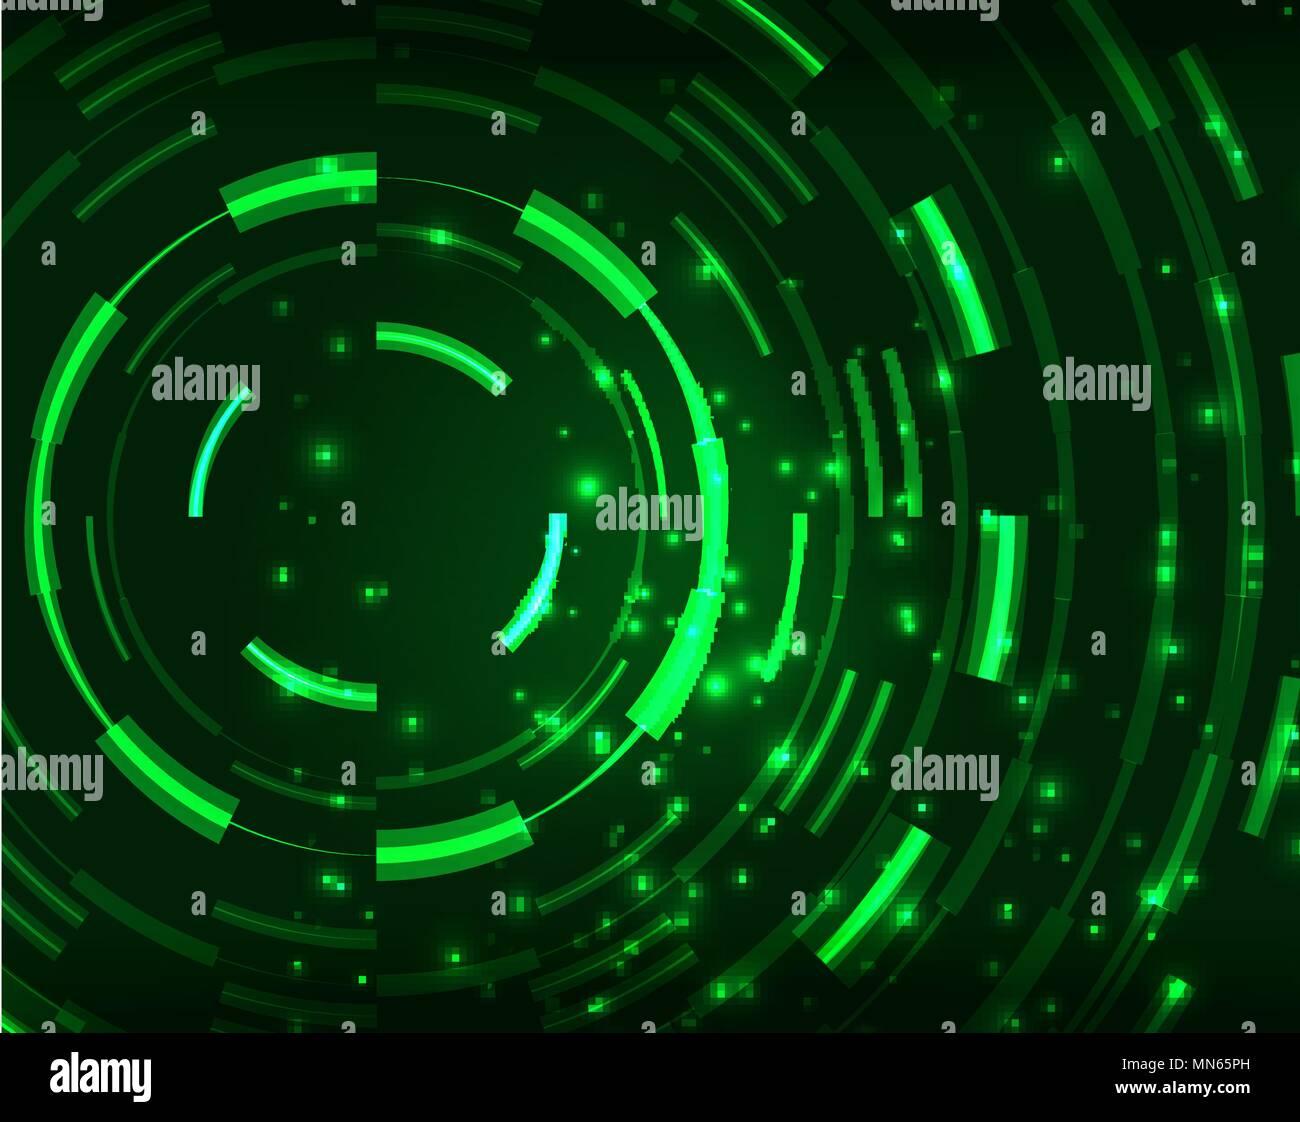 Neon Circles Abstract Background Neon Green Circles Vector